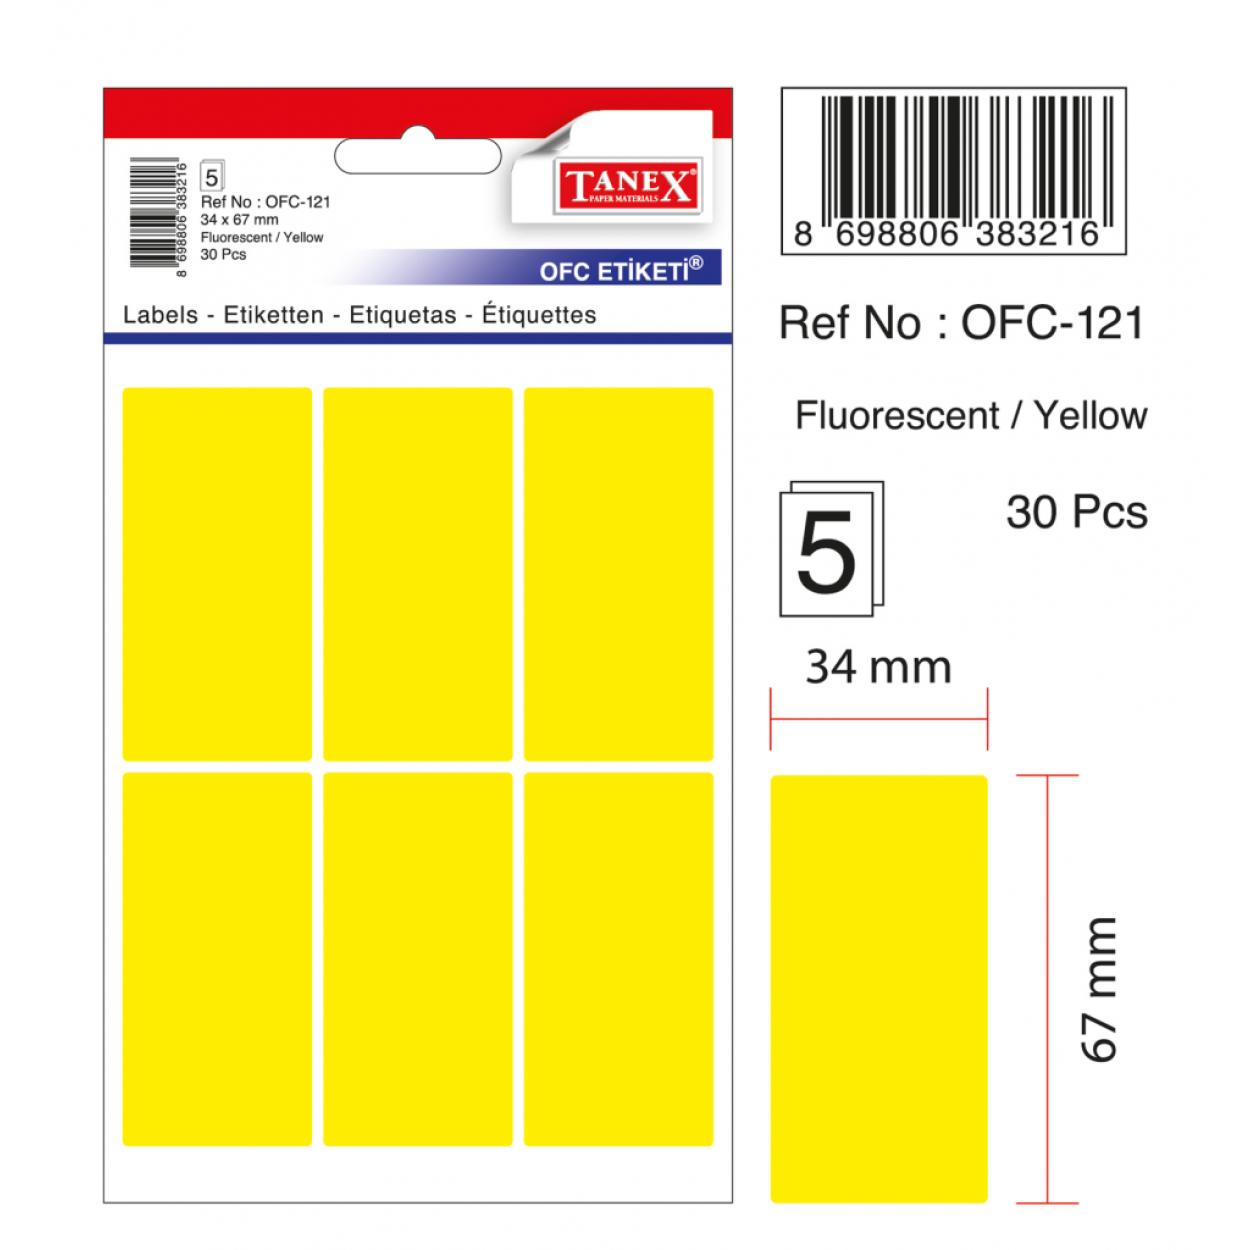 Tanex Ofc-121 Flo Sarı Ofis Etiketi